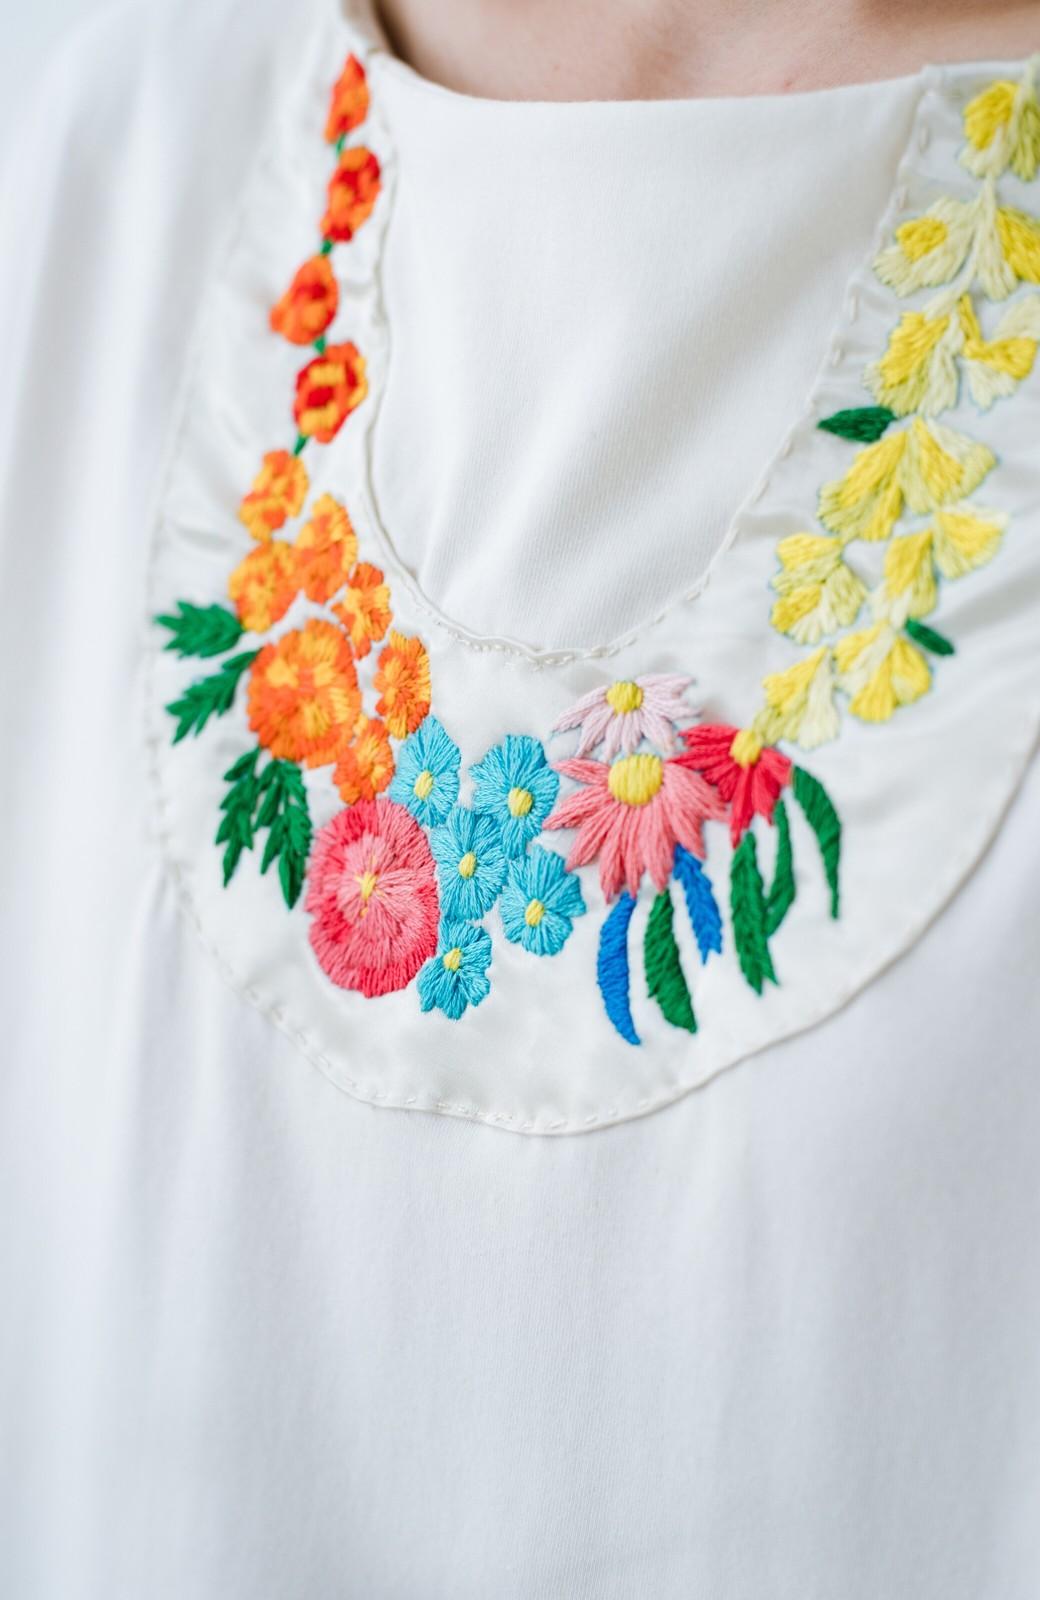 haco! Stitch by Stitch(flower)オーガニックコットンのTシャツワンピース&レギンスセット <ホワイト>の商品写真3